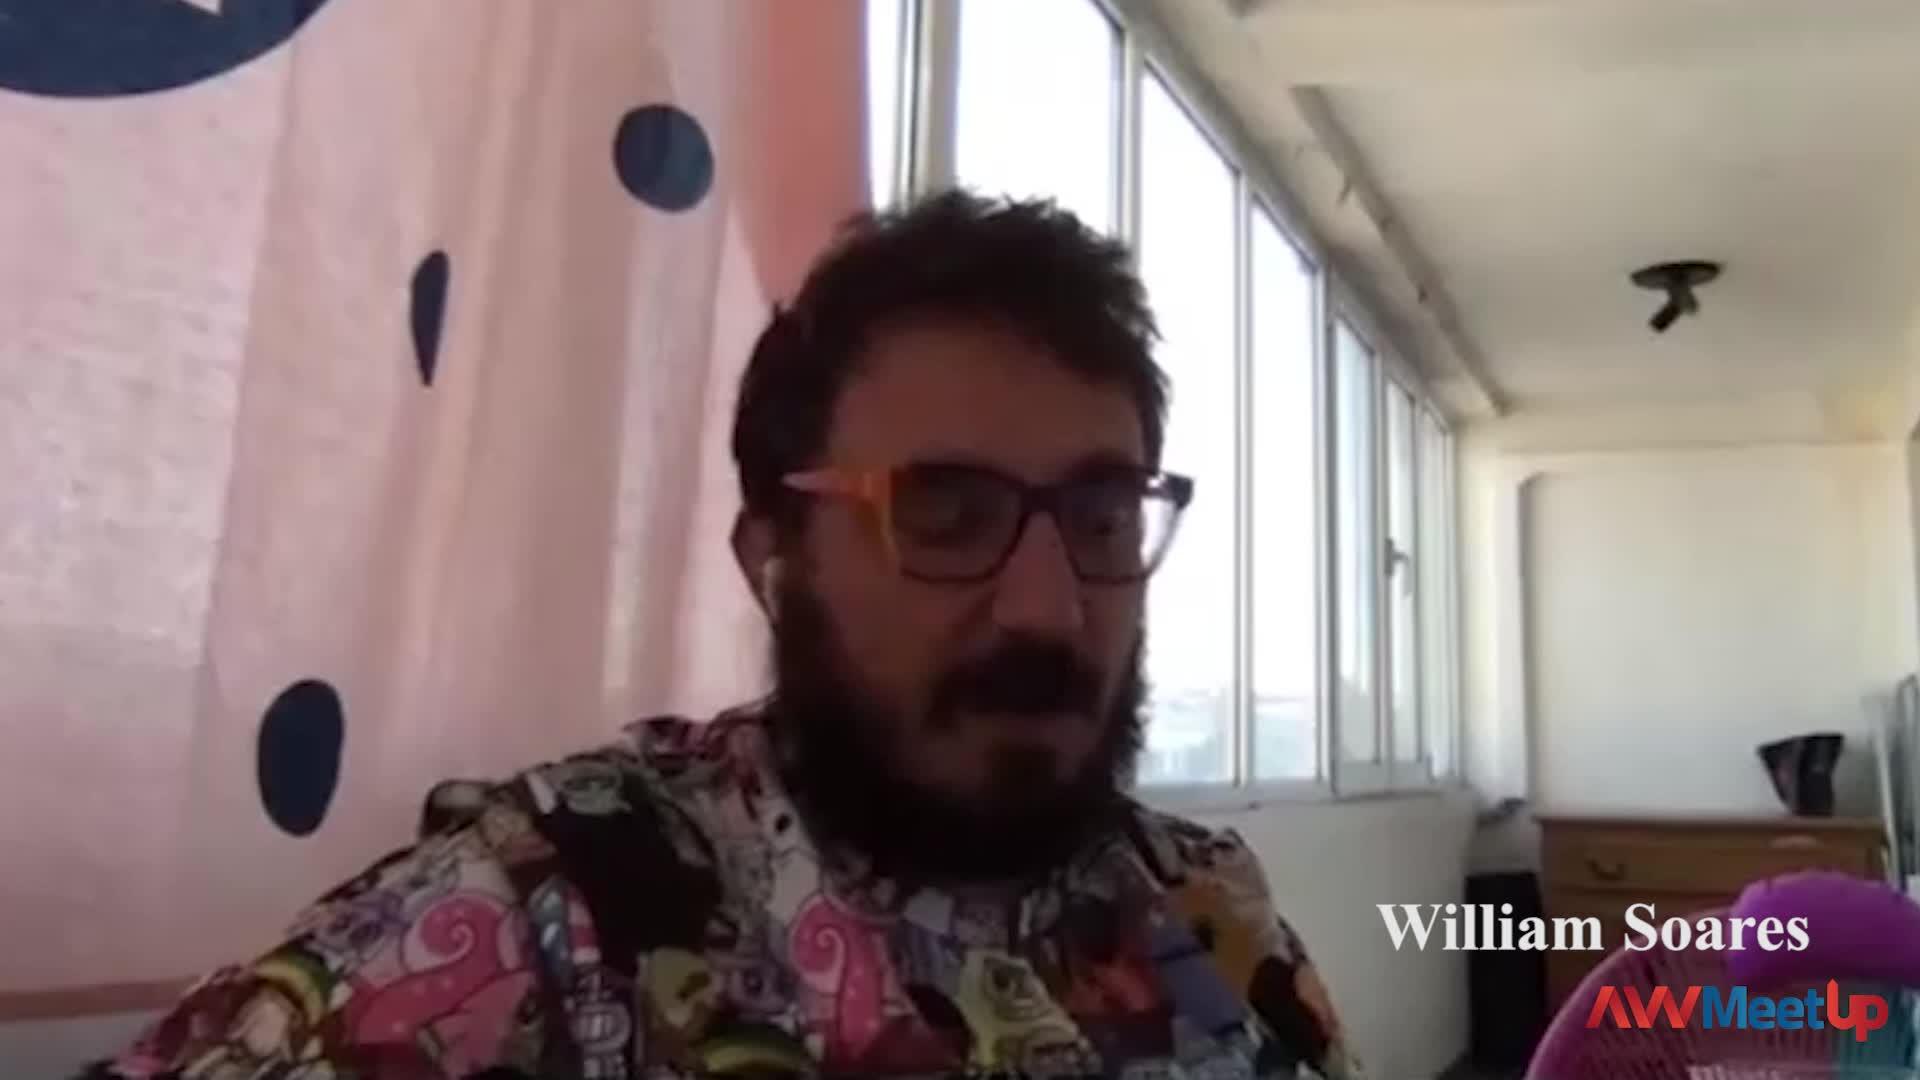 AWMeetup Day 1 Talkshow with Thomas Skavhellen #3 - thumbnail